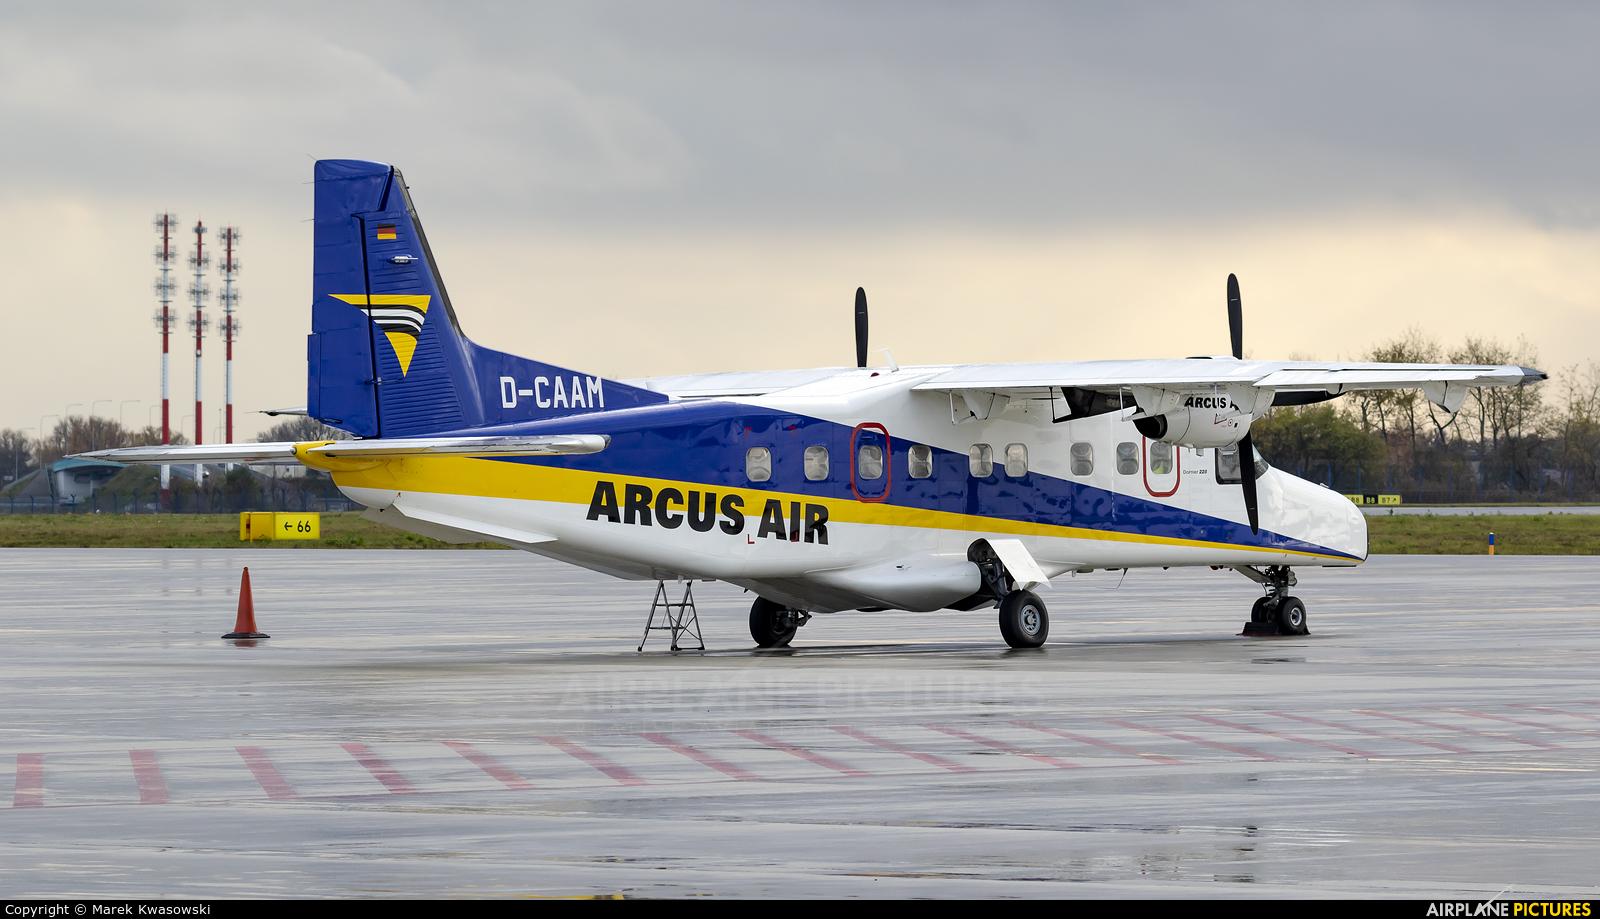 Arcus Air D-CAAM aircraft at Warsaw - Frederic Chopin